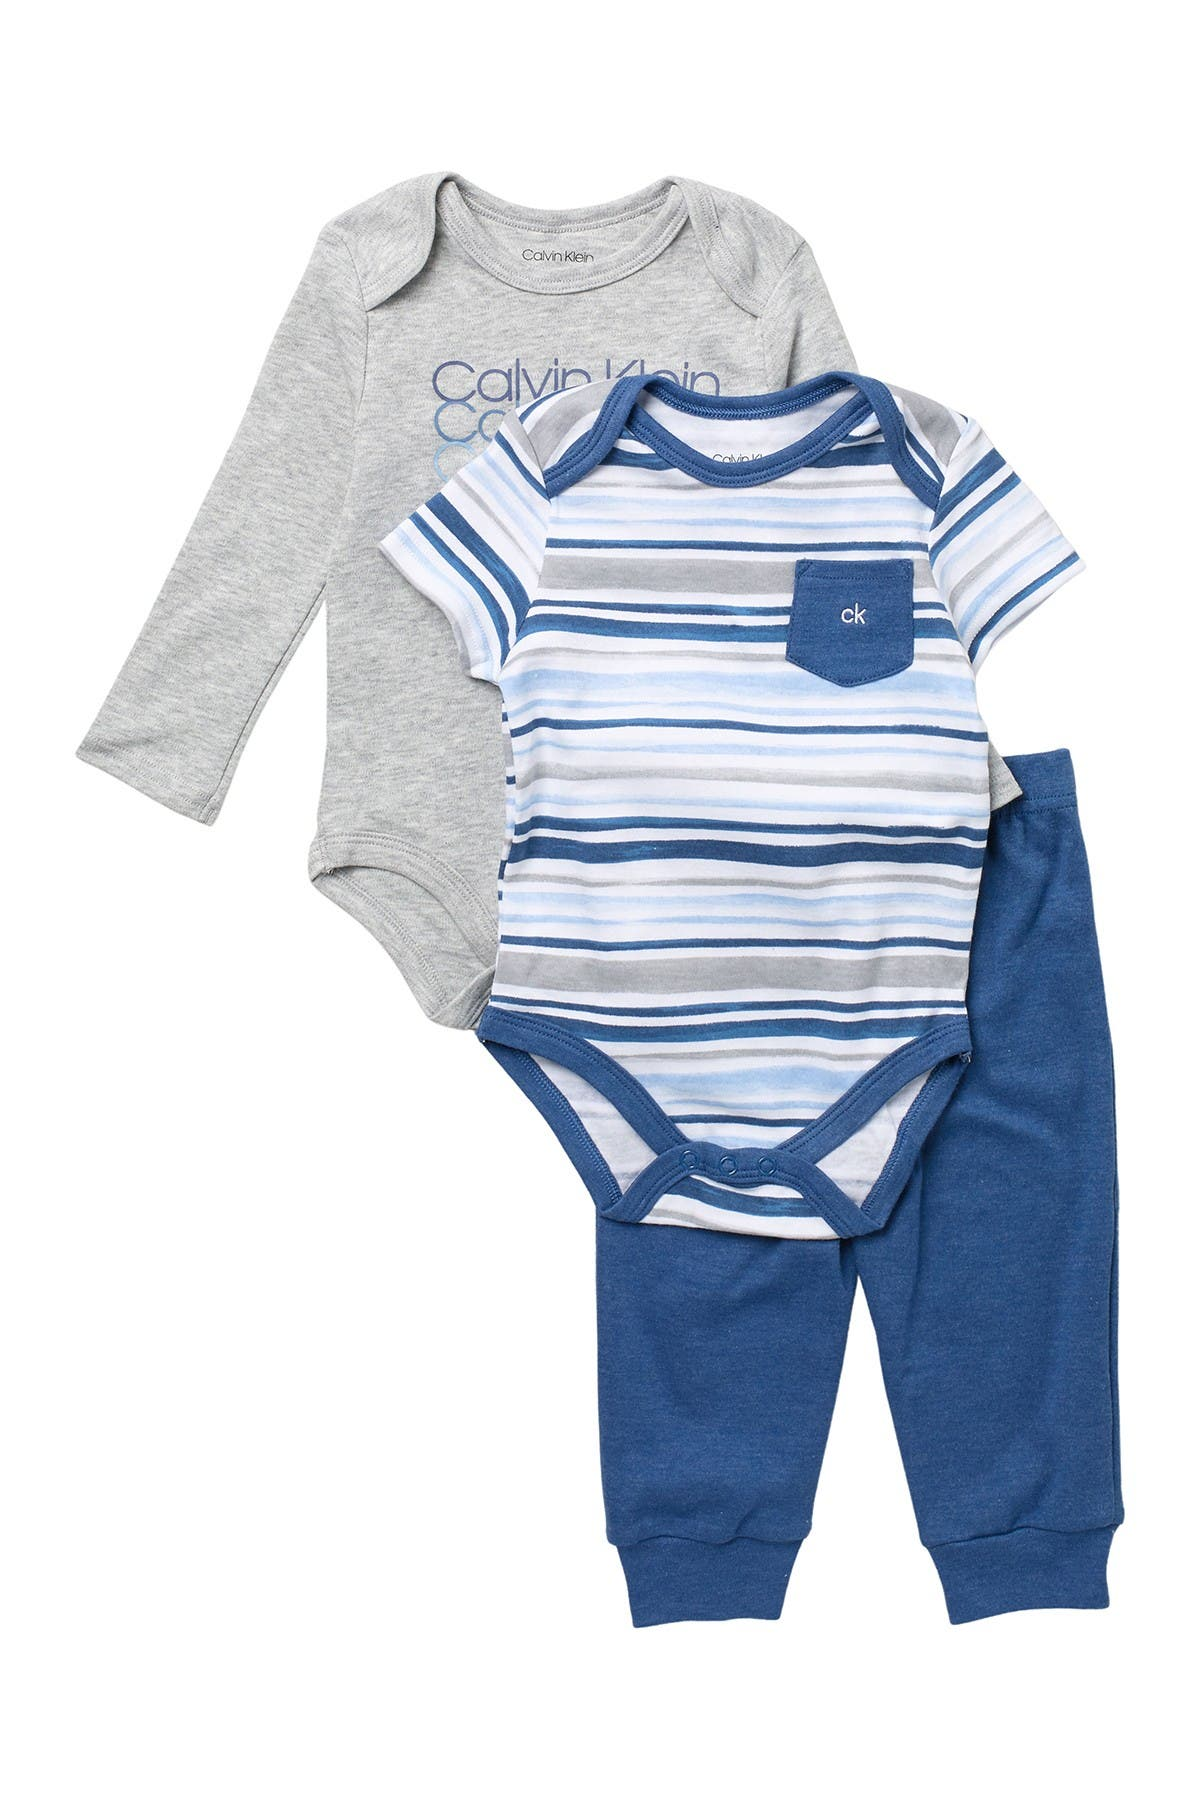 Image of Calvin Klein Bodysuits & Pant Set